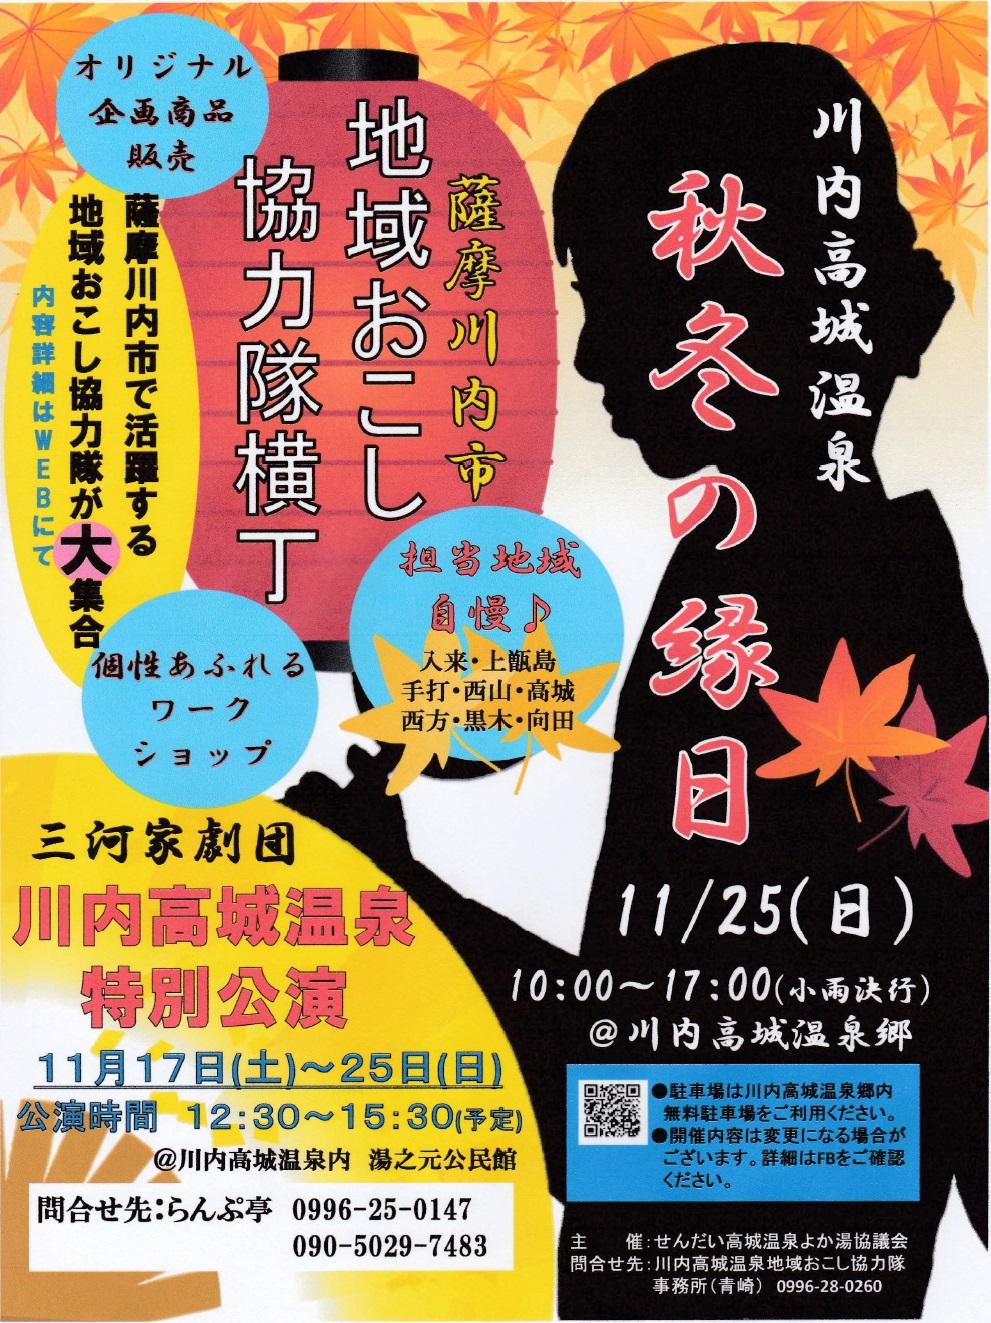 川内高城温泉 秋冬の縁日